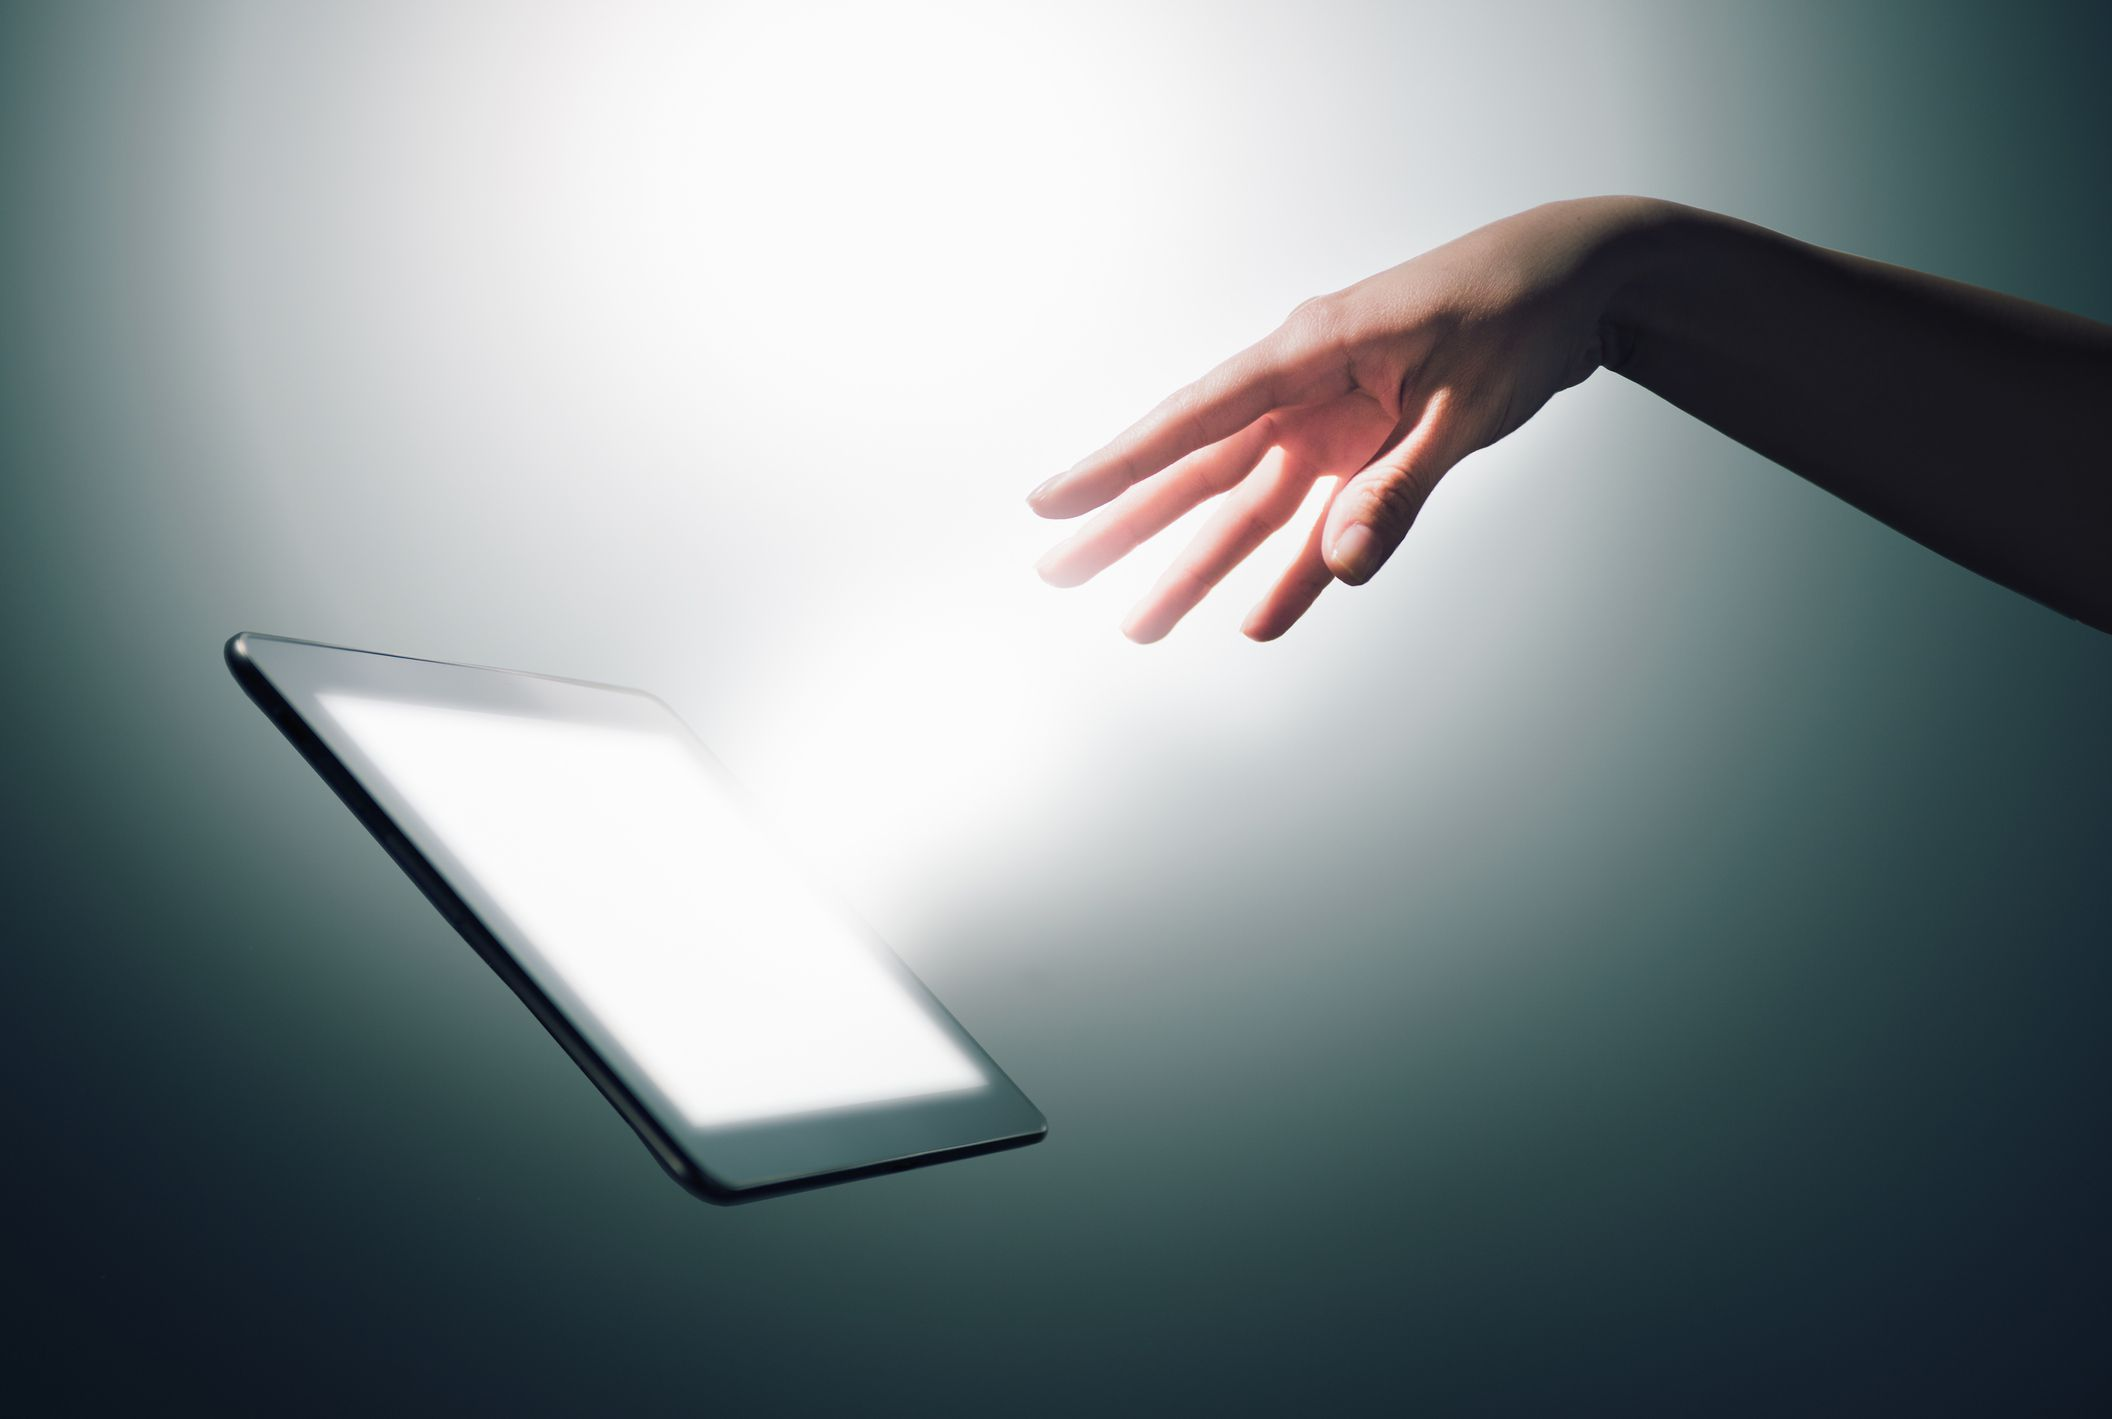 A hand commanding a digital tablet.